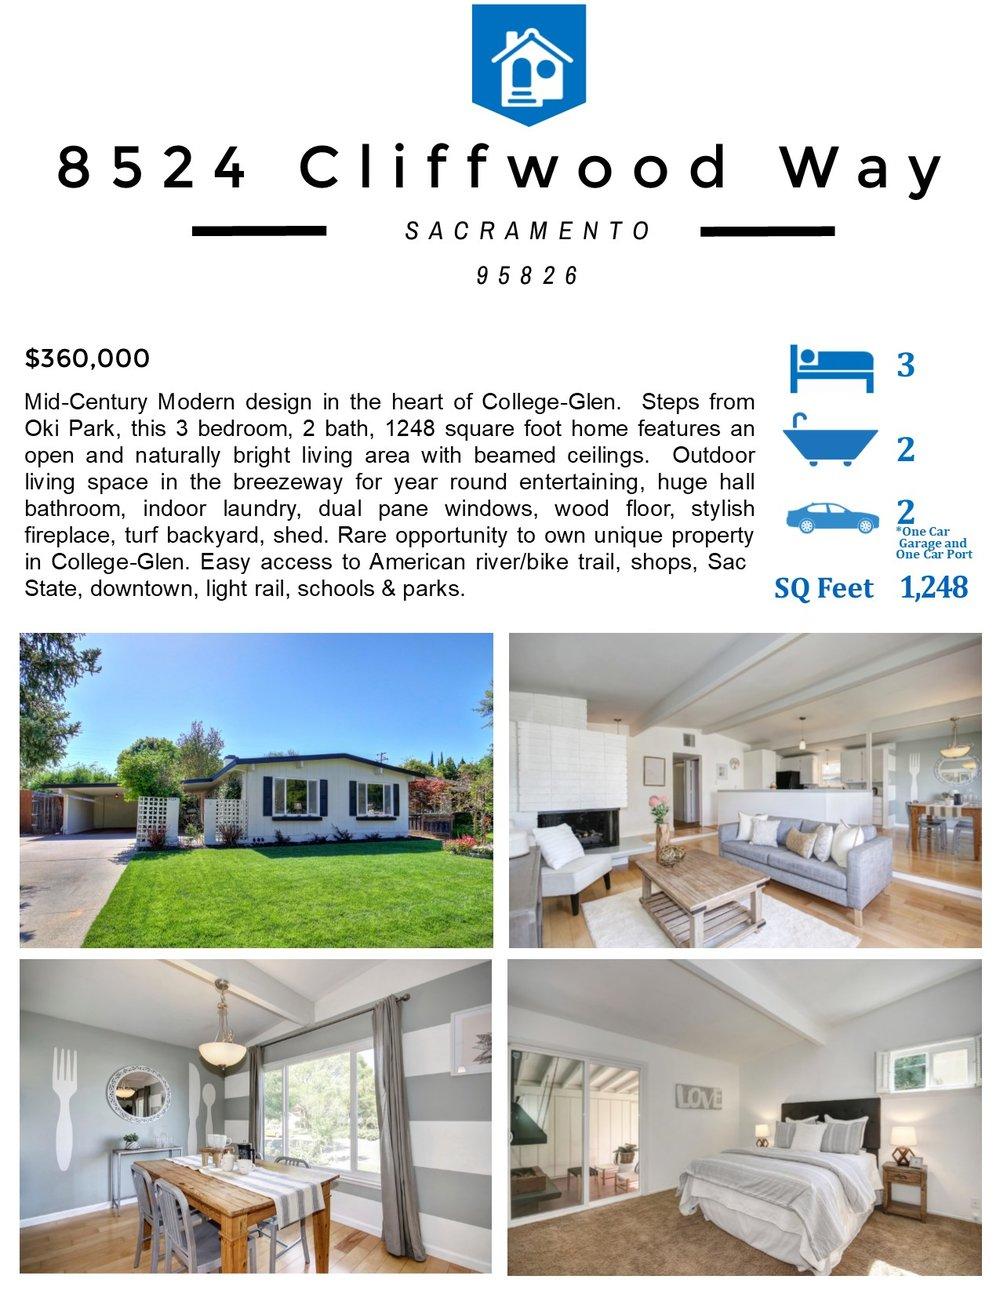 Flyer Front - 8524 Cliffwood Way Sacramento CA 95826.jpg